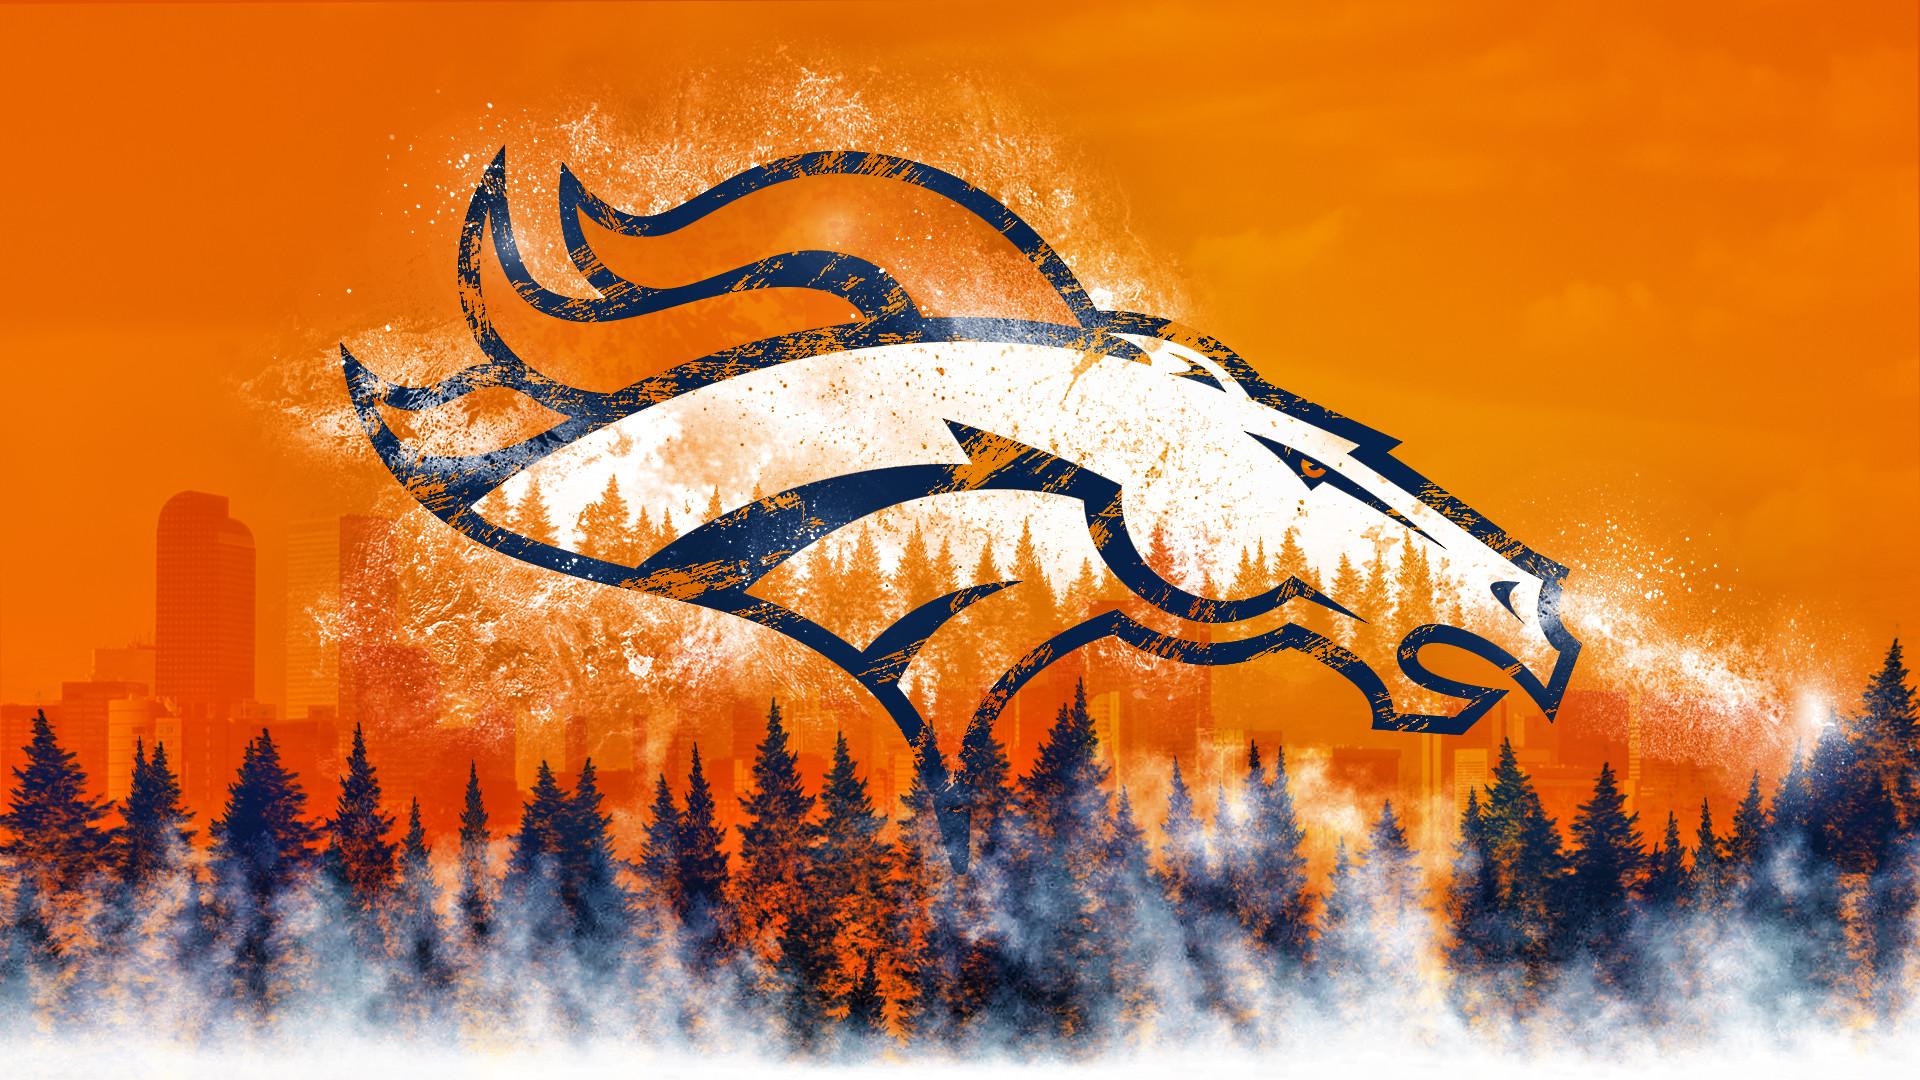 Great Minimalist Blue Broncos Wallpaper Football Team Pictures 640×1136 Denver  Broncos Wallpaper (49 Wallpapers)   Adorable Wallpapers   Pinterest    Broncos …